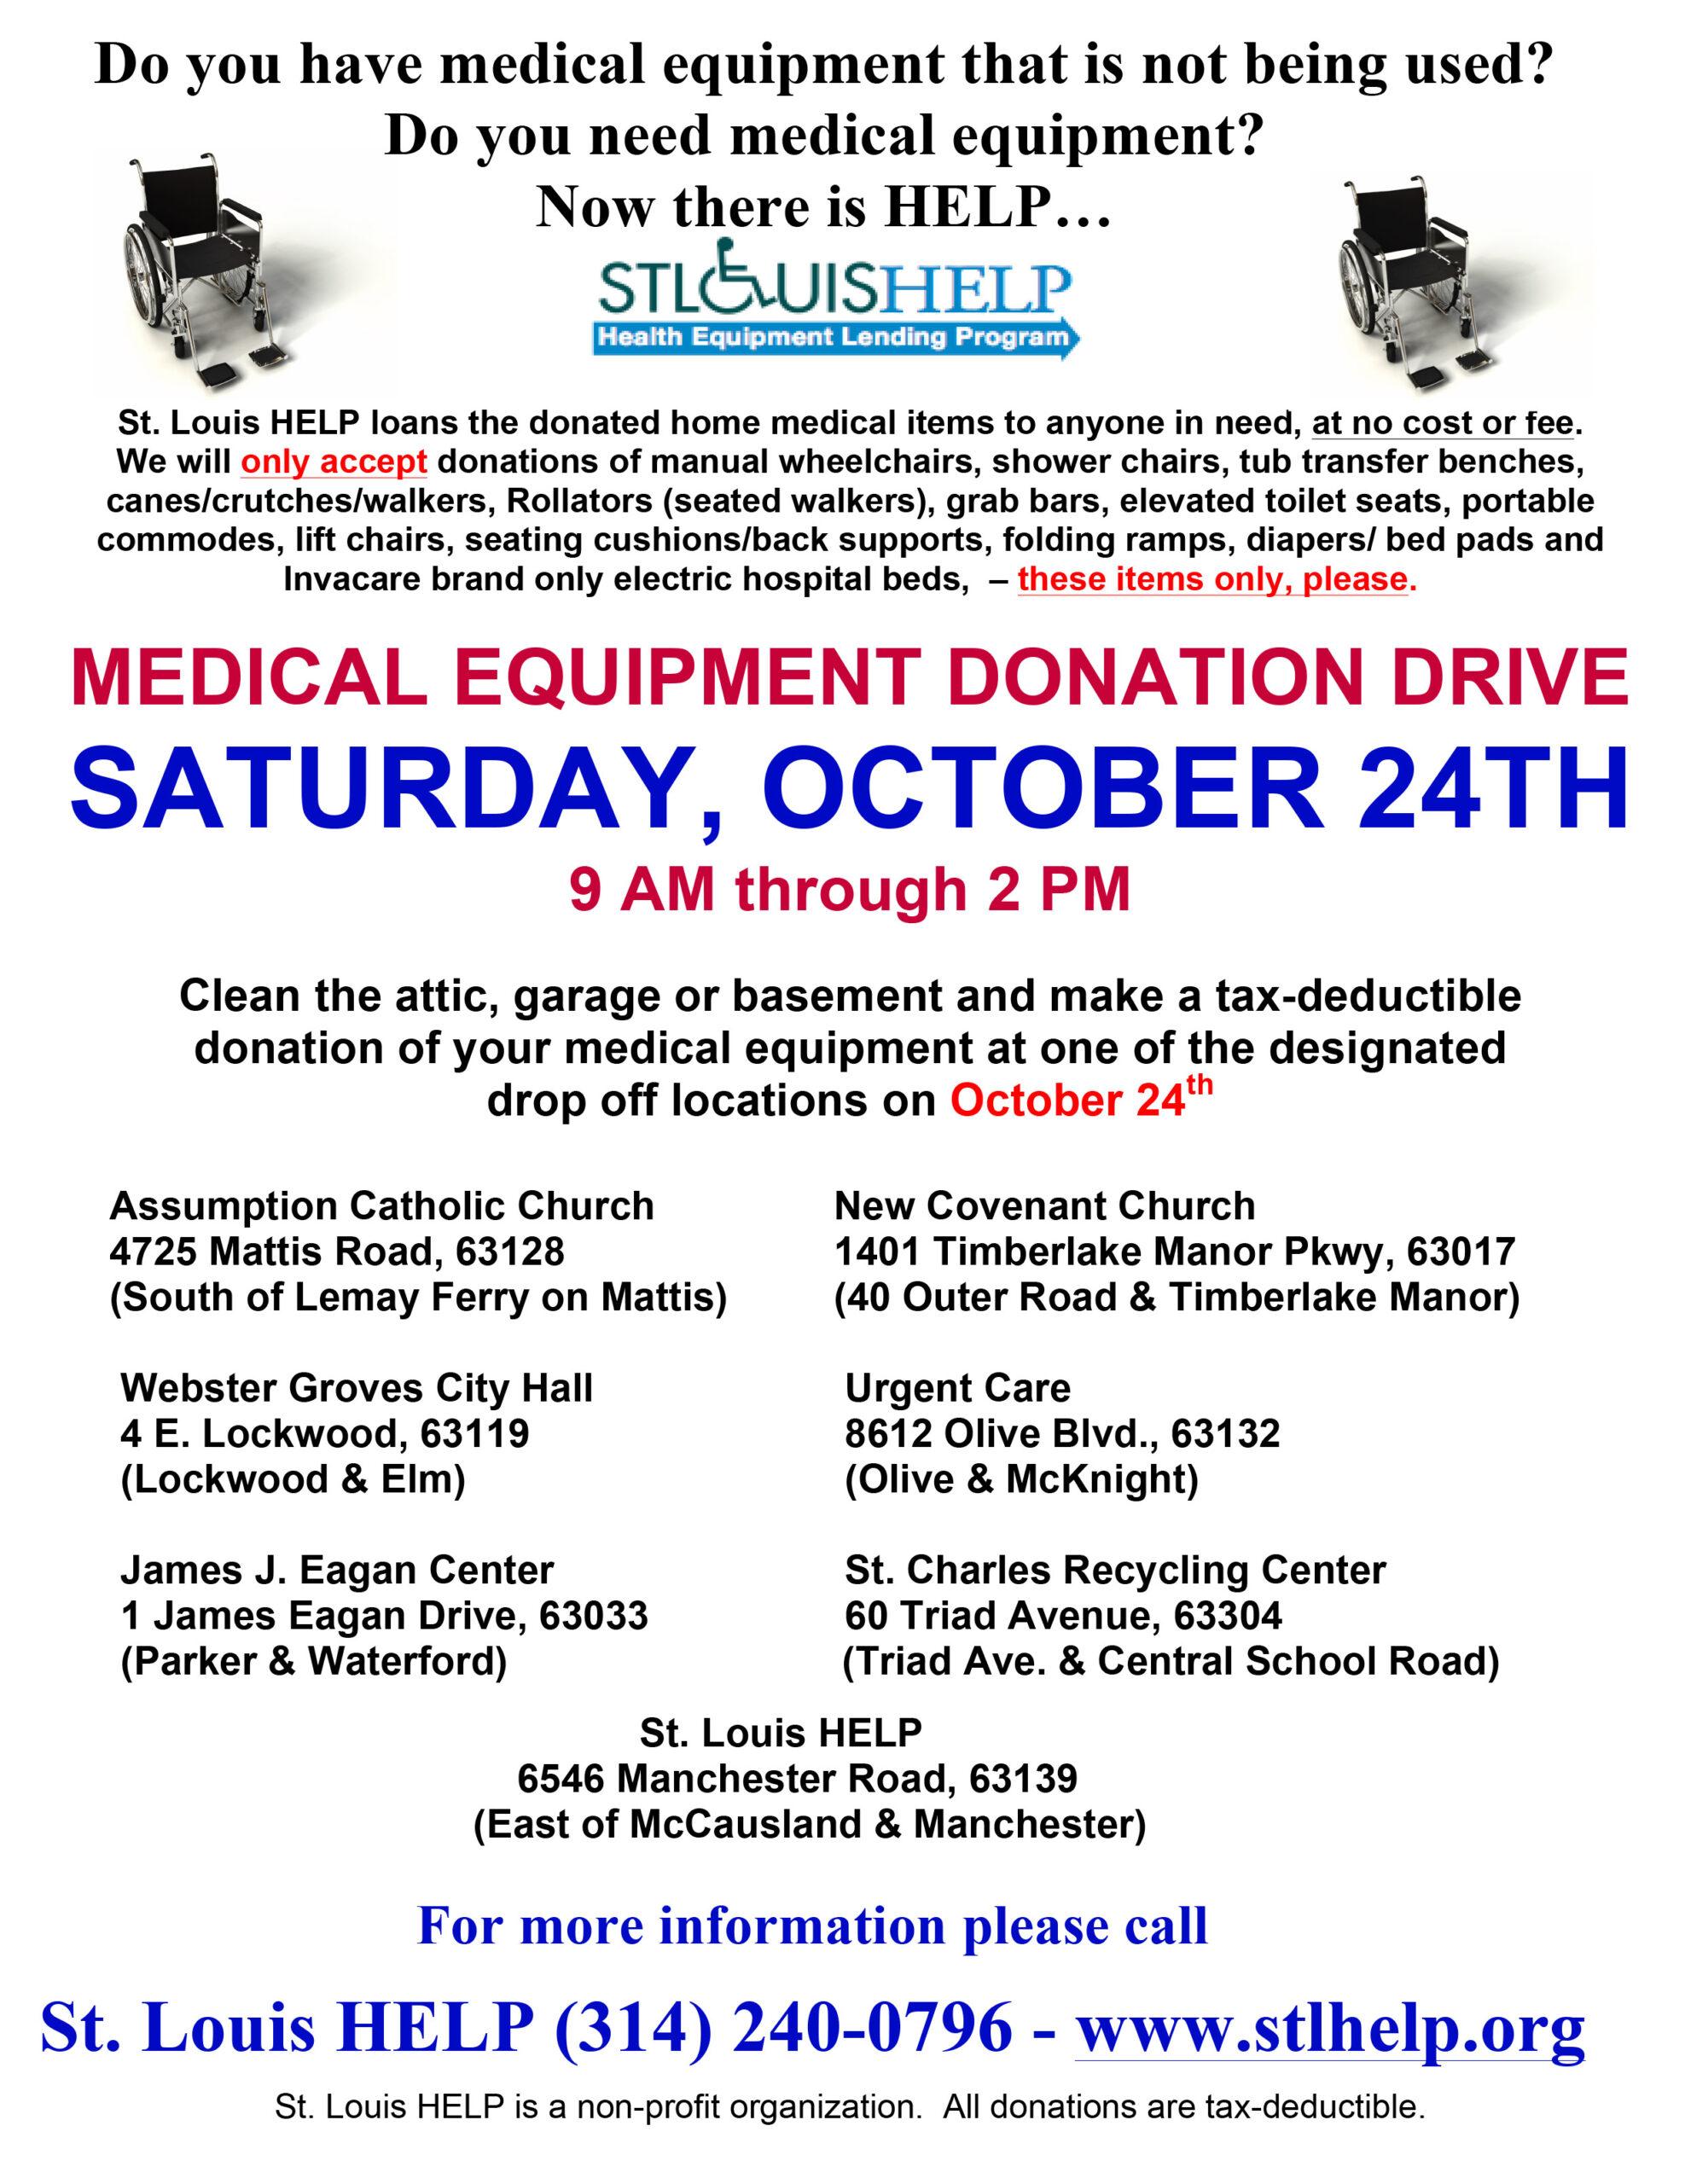 Medical Equipment Donation Drive